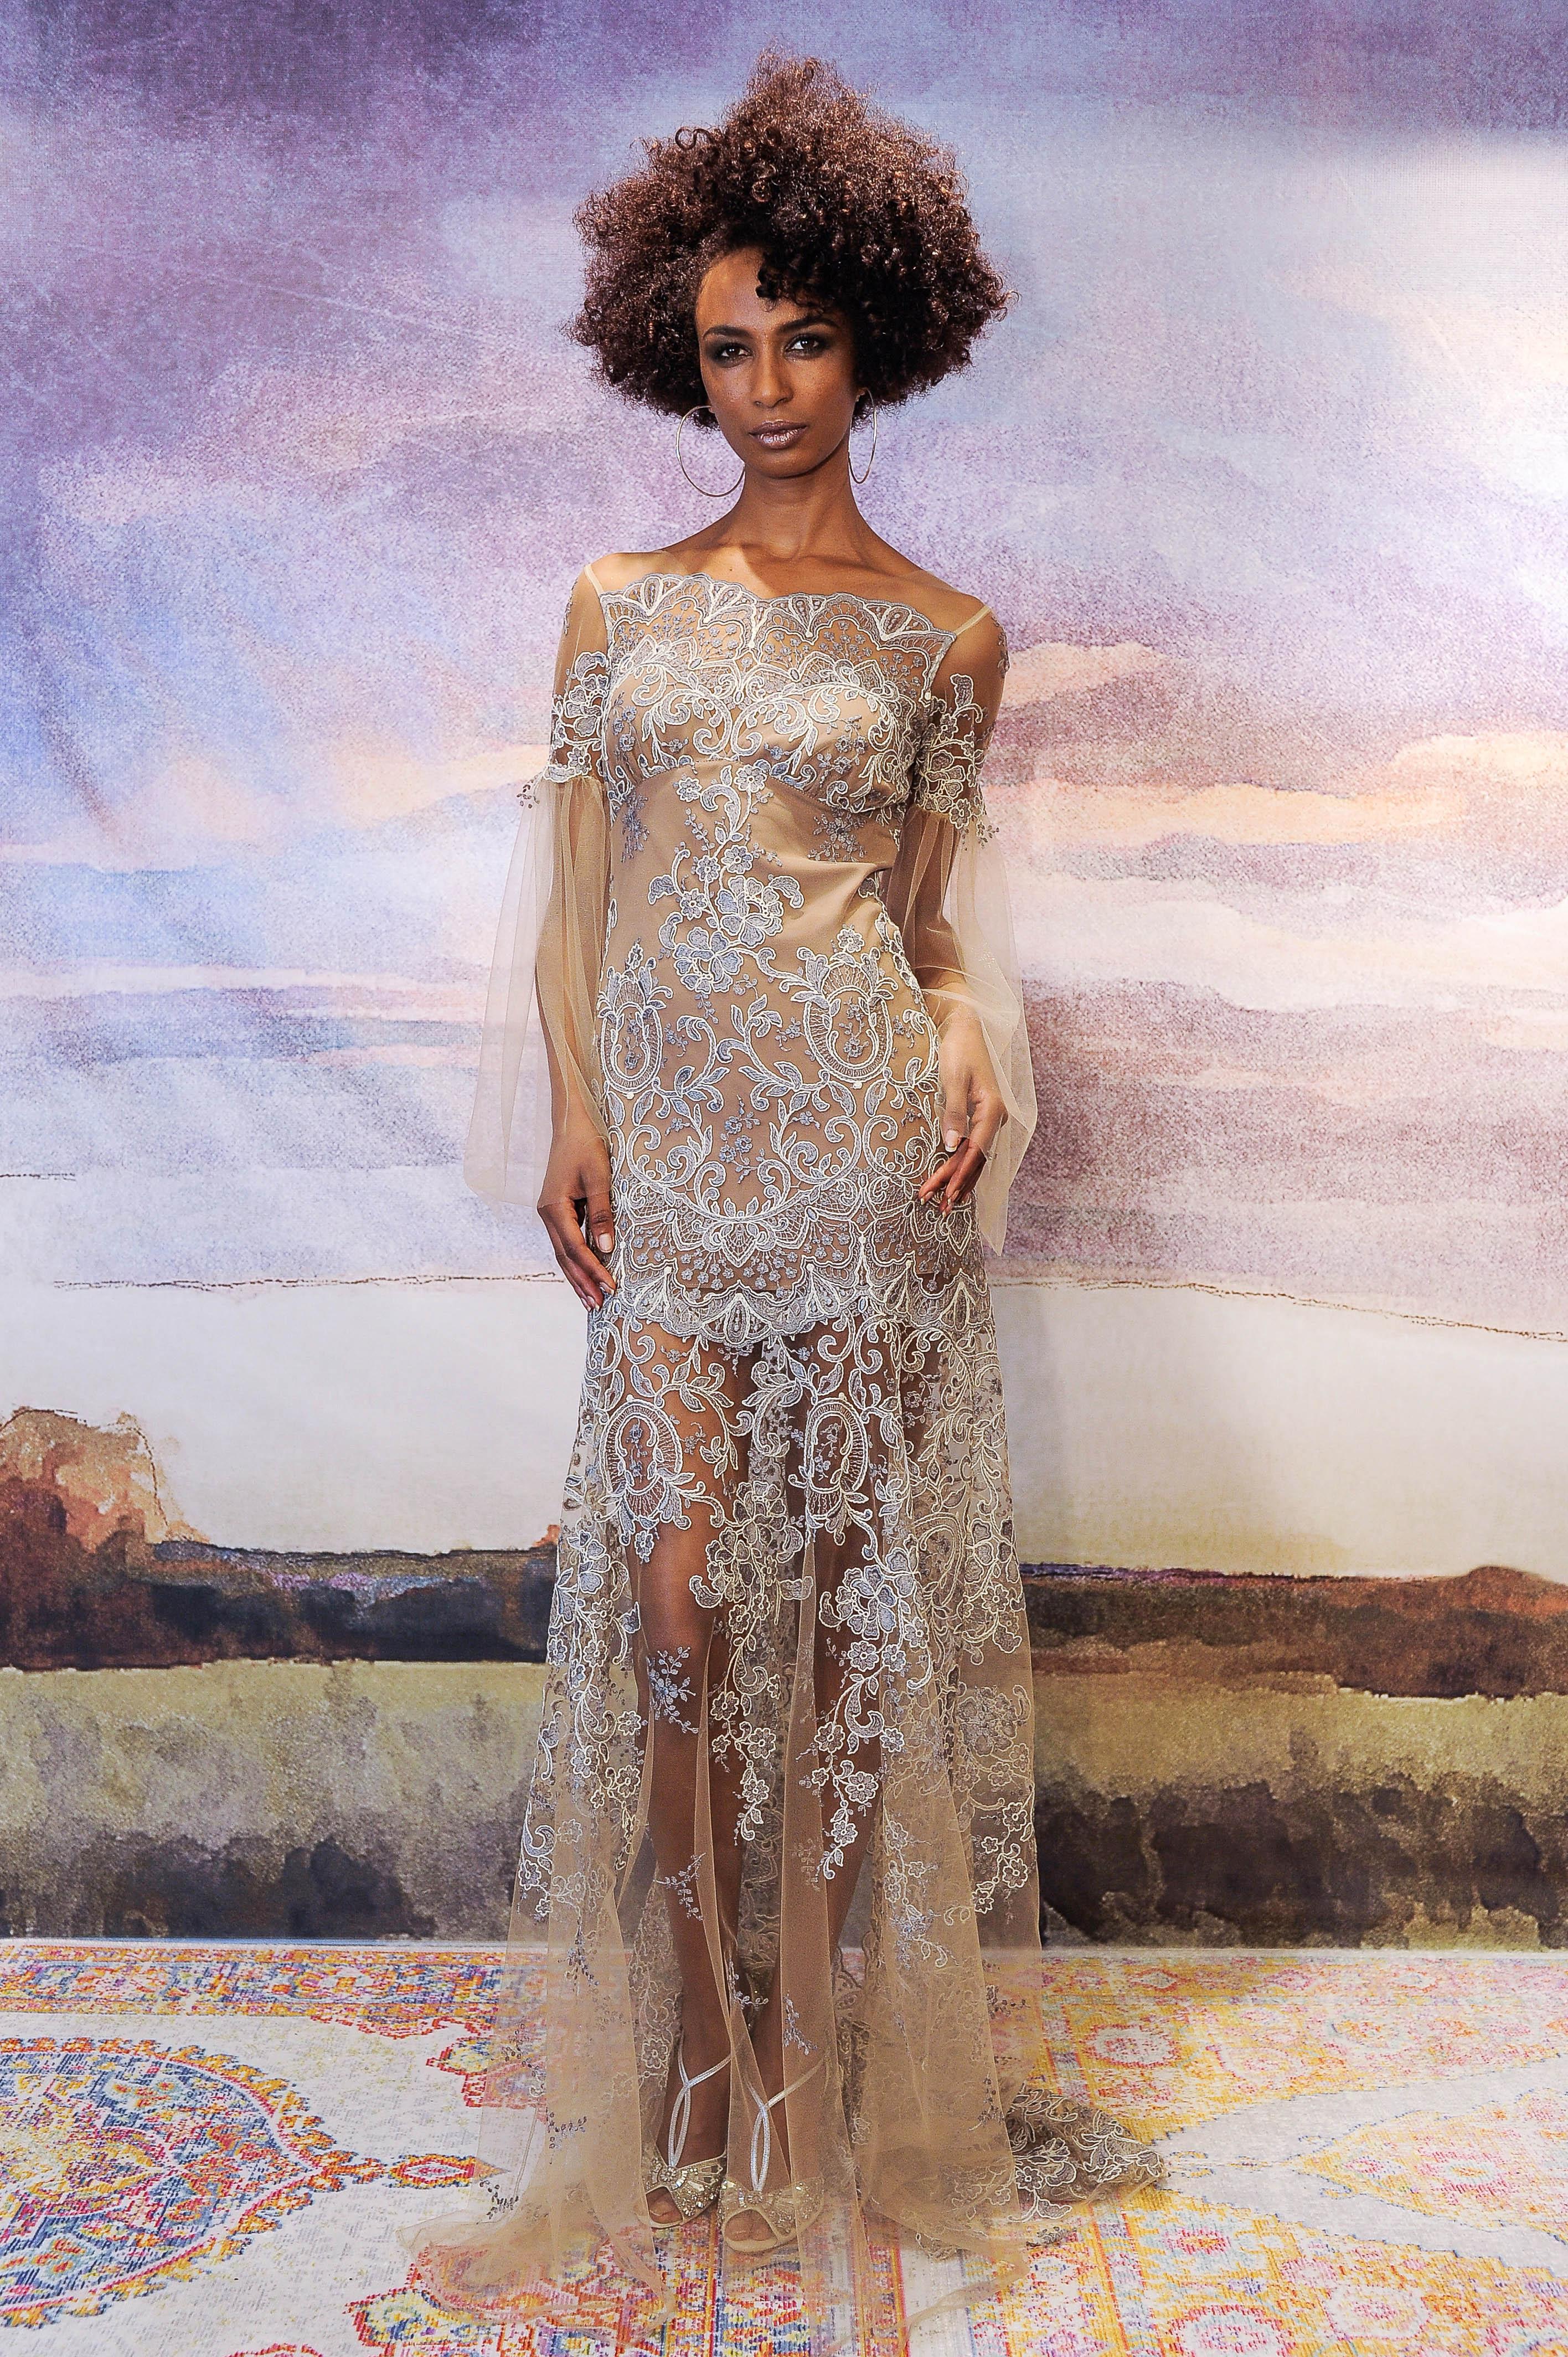 claire pettibone nude sheath wedding dress with lace applique fall 2018